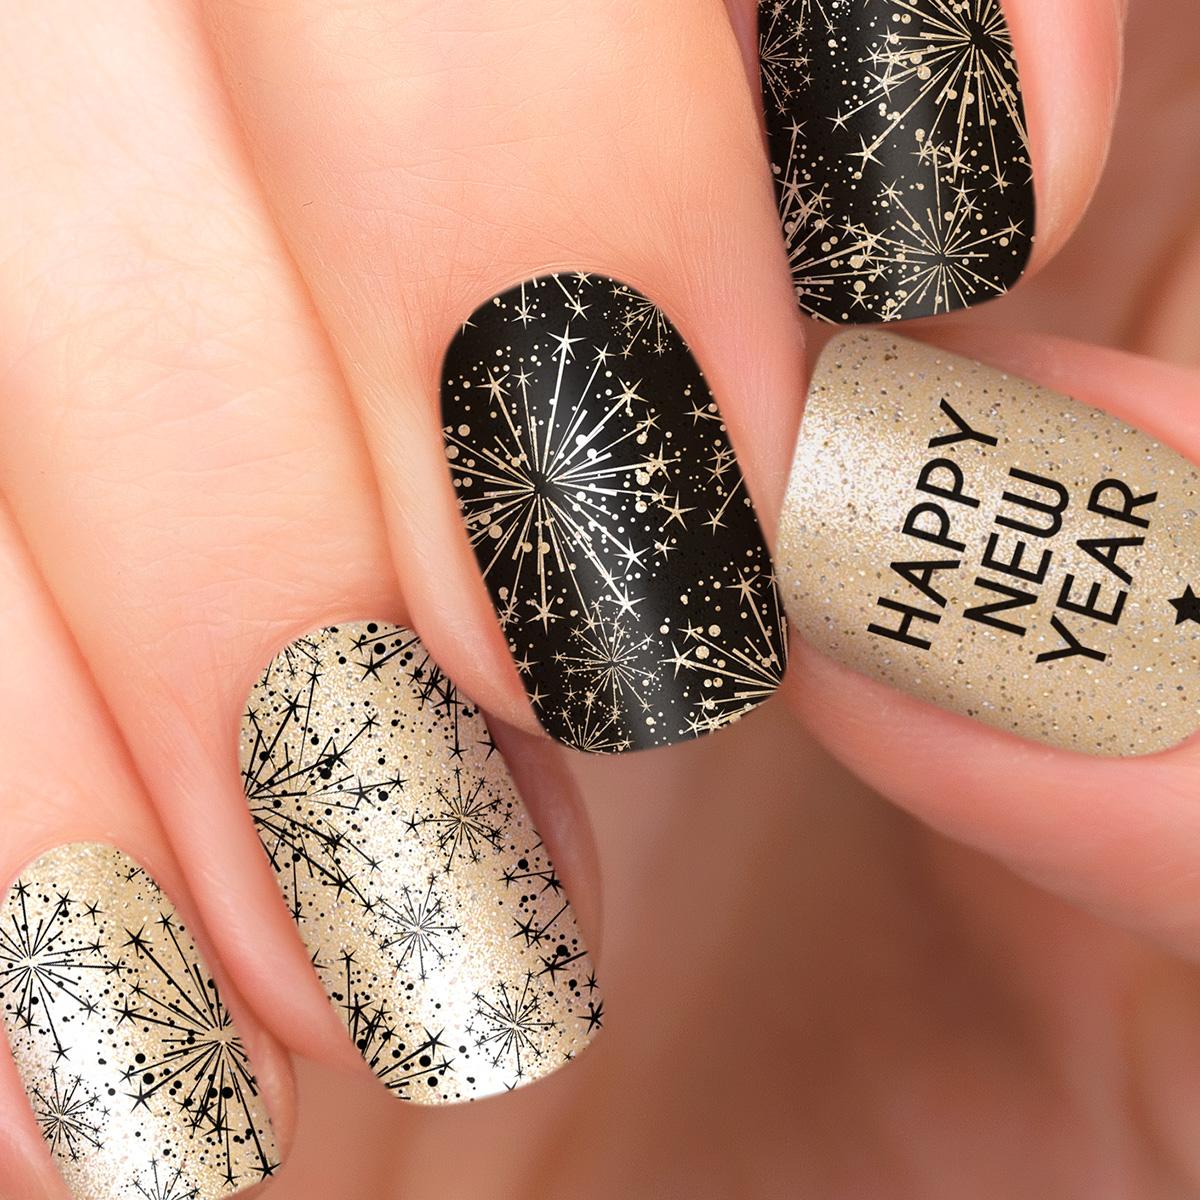 Incoco.com Incoco Nail Polish Strips, New Year Cheer